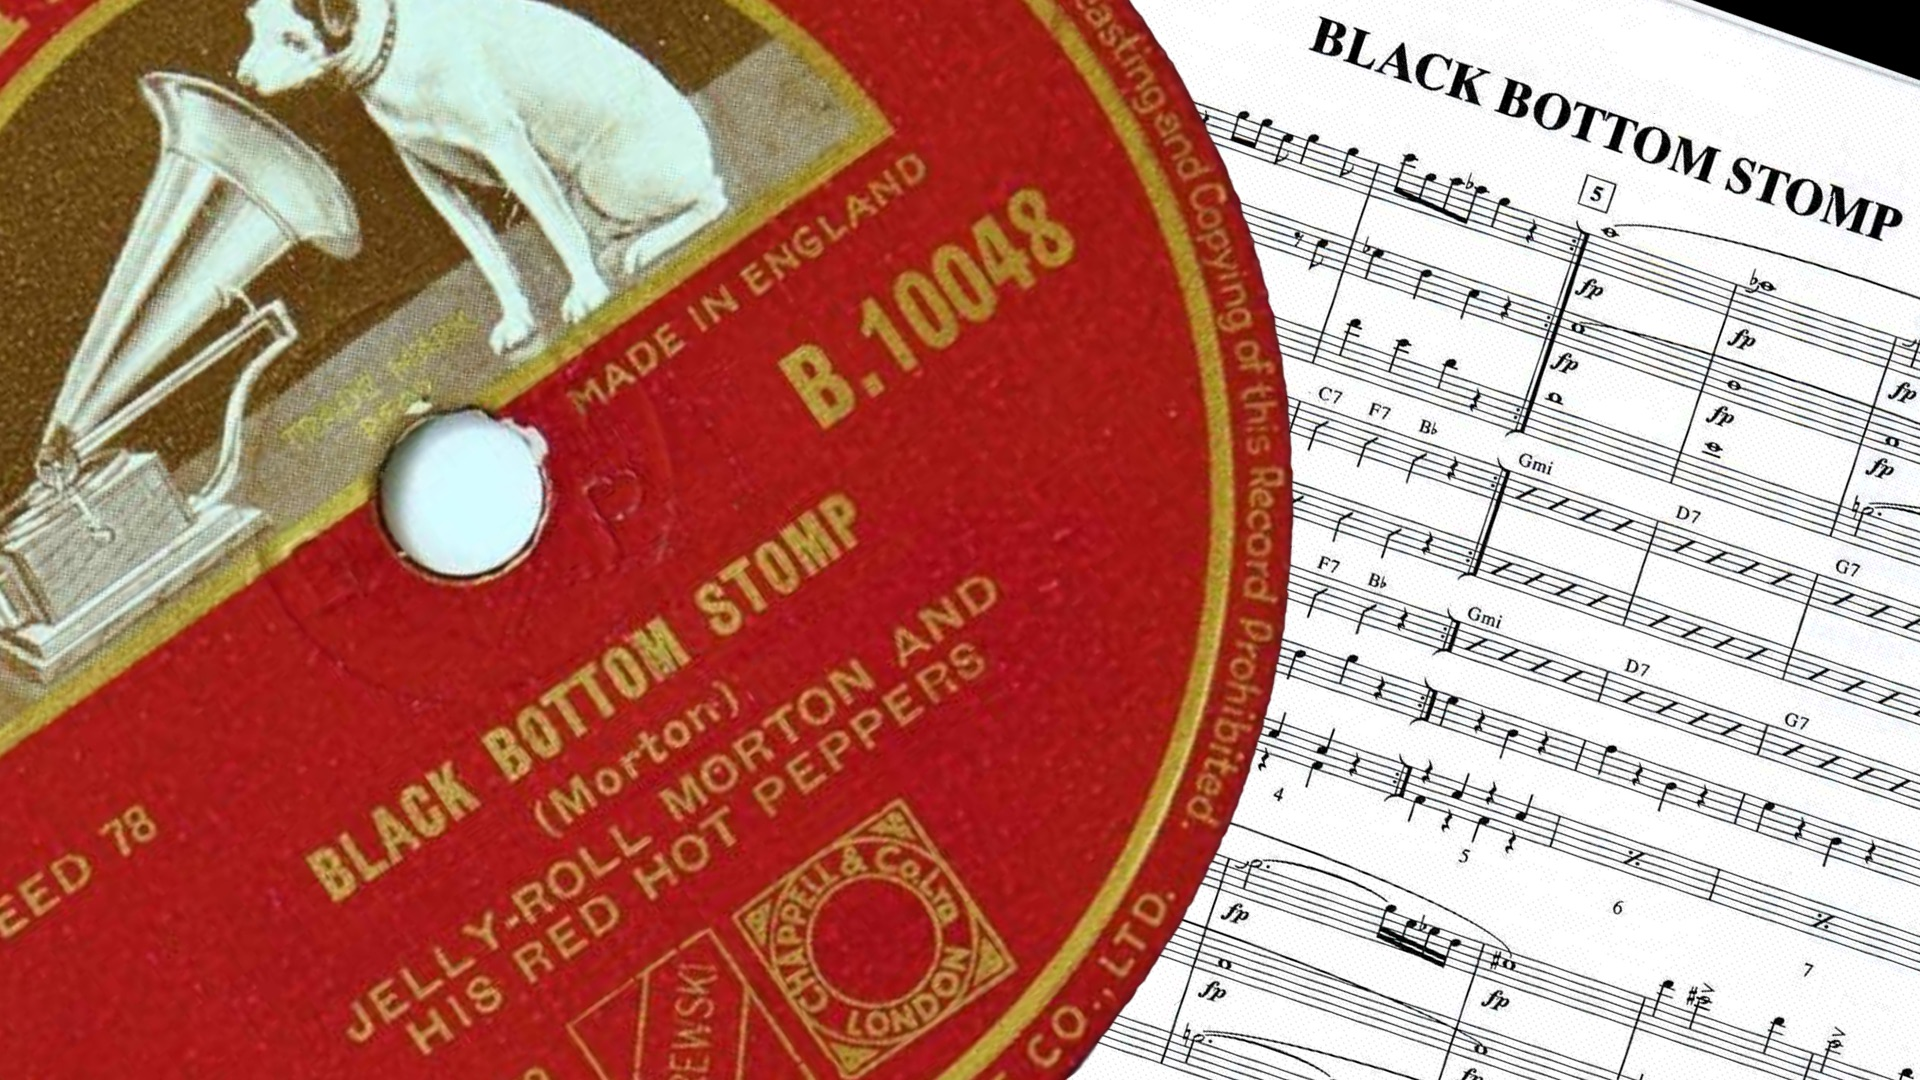 Ellington Black Bottom Stomp